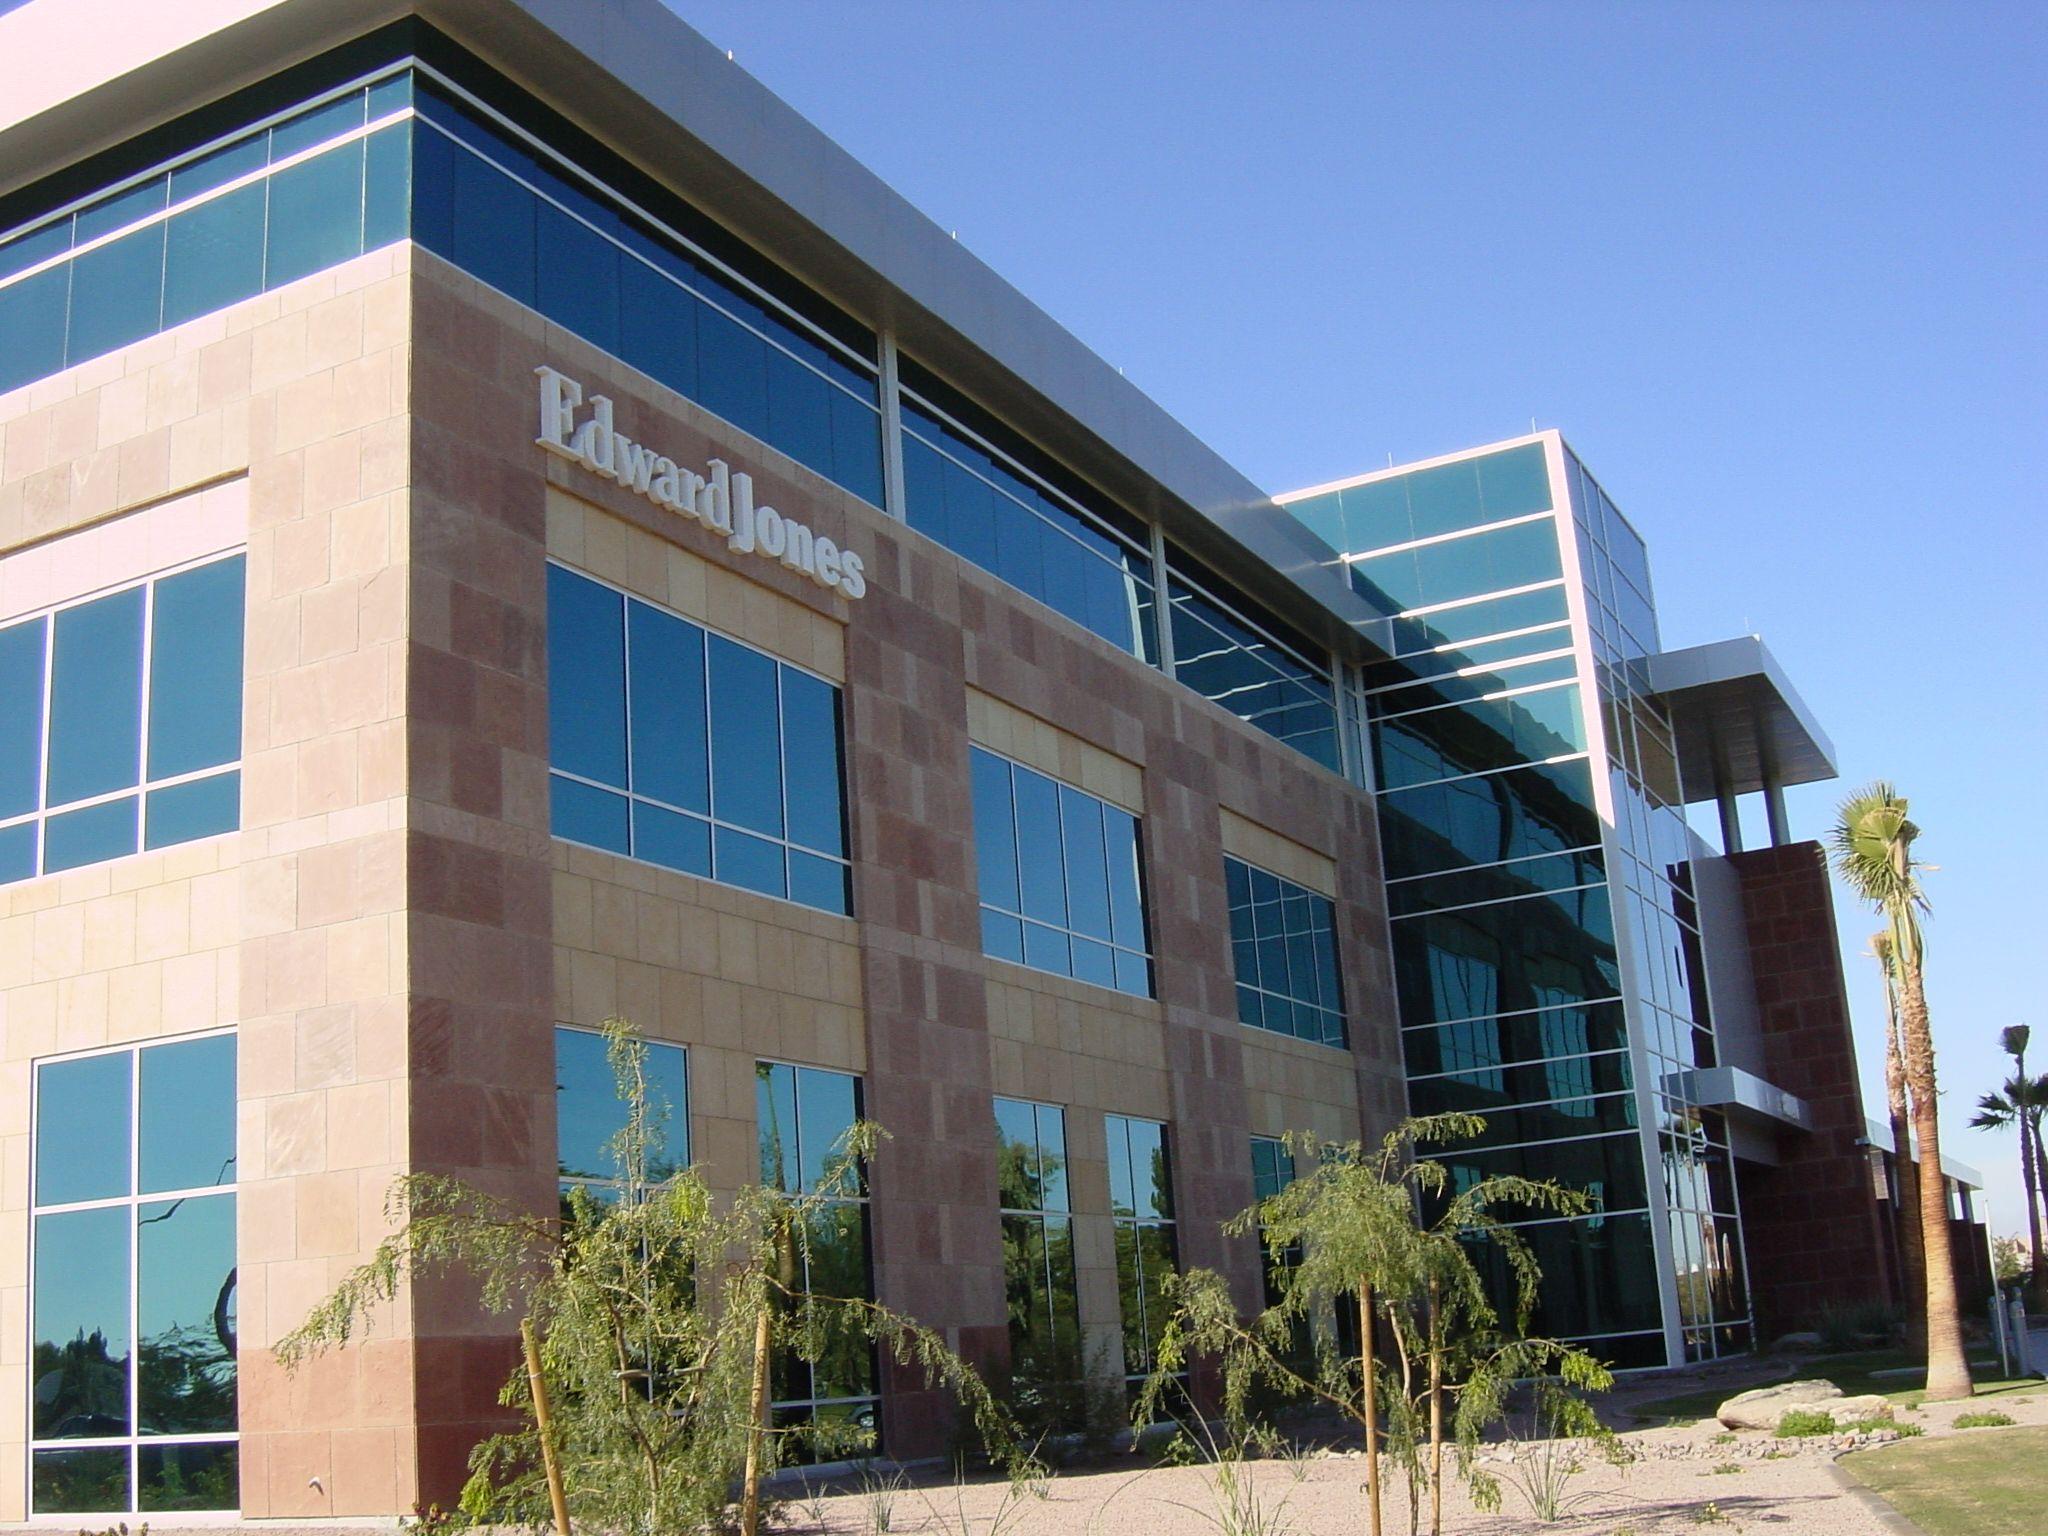 Edward Jones Regional Headquarters   Tempe, AZ   Ryan Companies